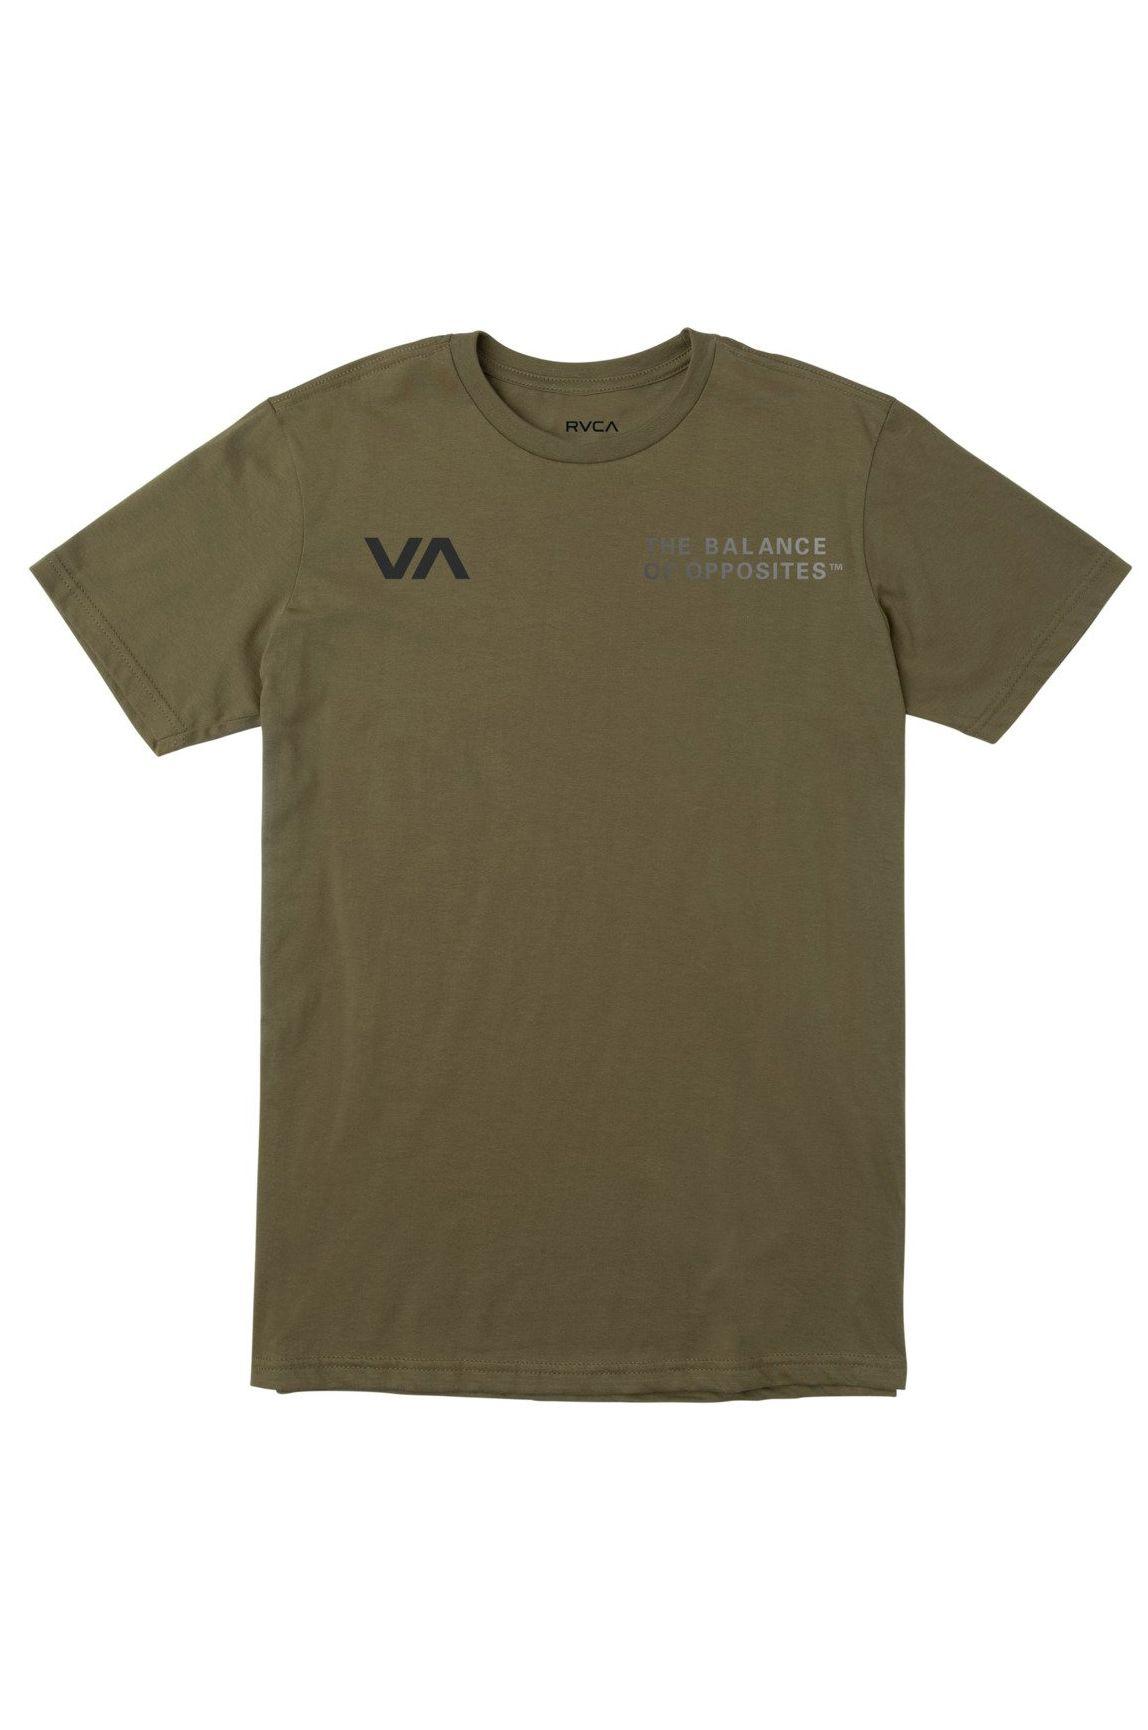 T-Shirt RVCA VA GLORY SS VA SPORT Terre Verte